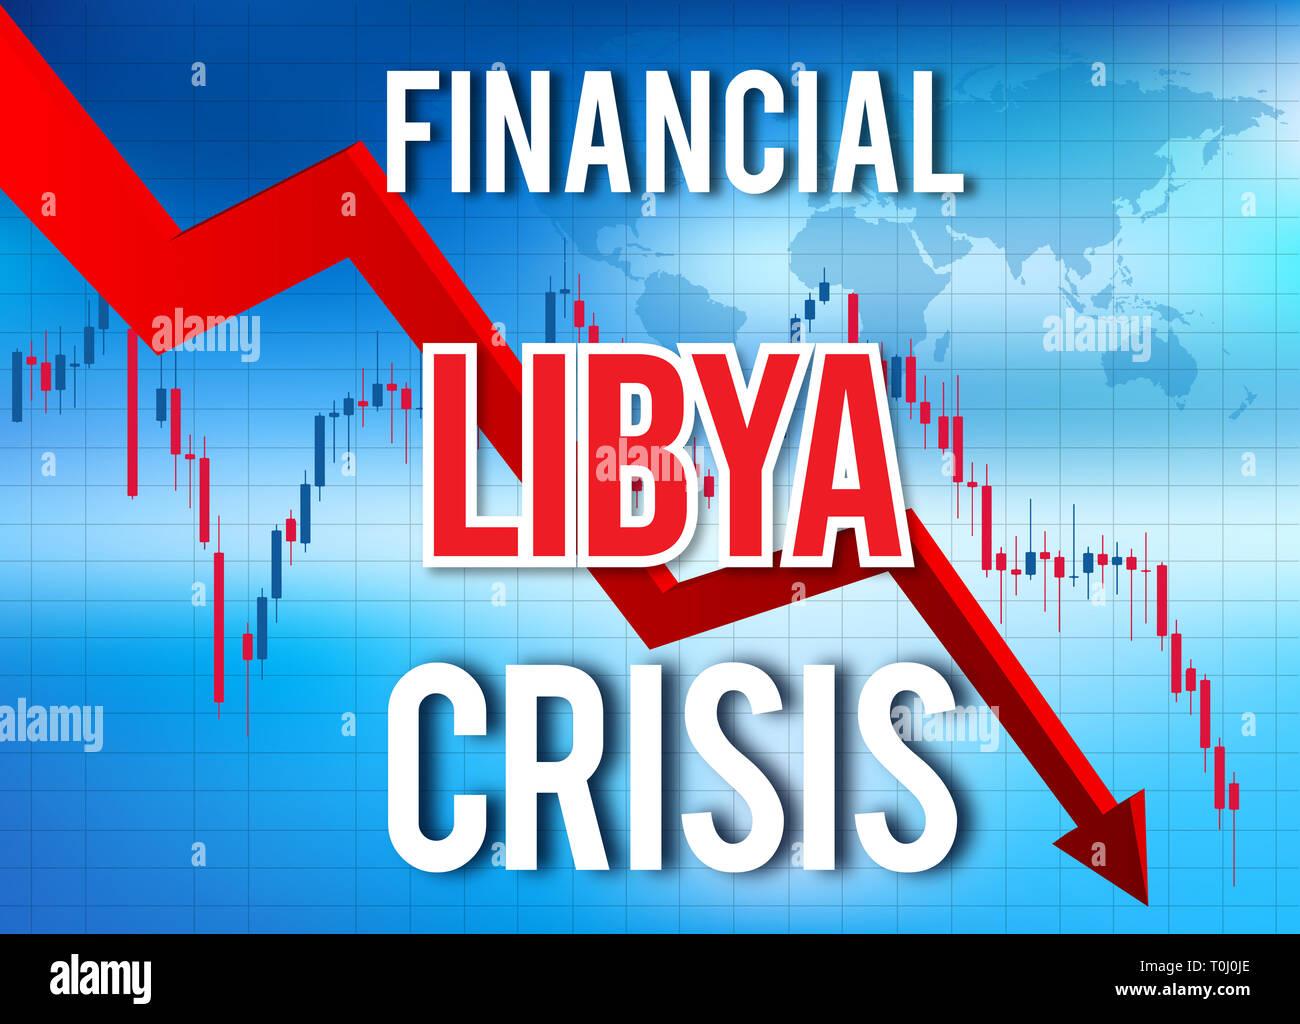 Libya Financial Crisis Economic Collapse Market Crash Global Meltdown Illustration. - Stock Image